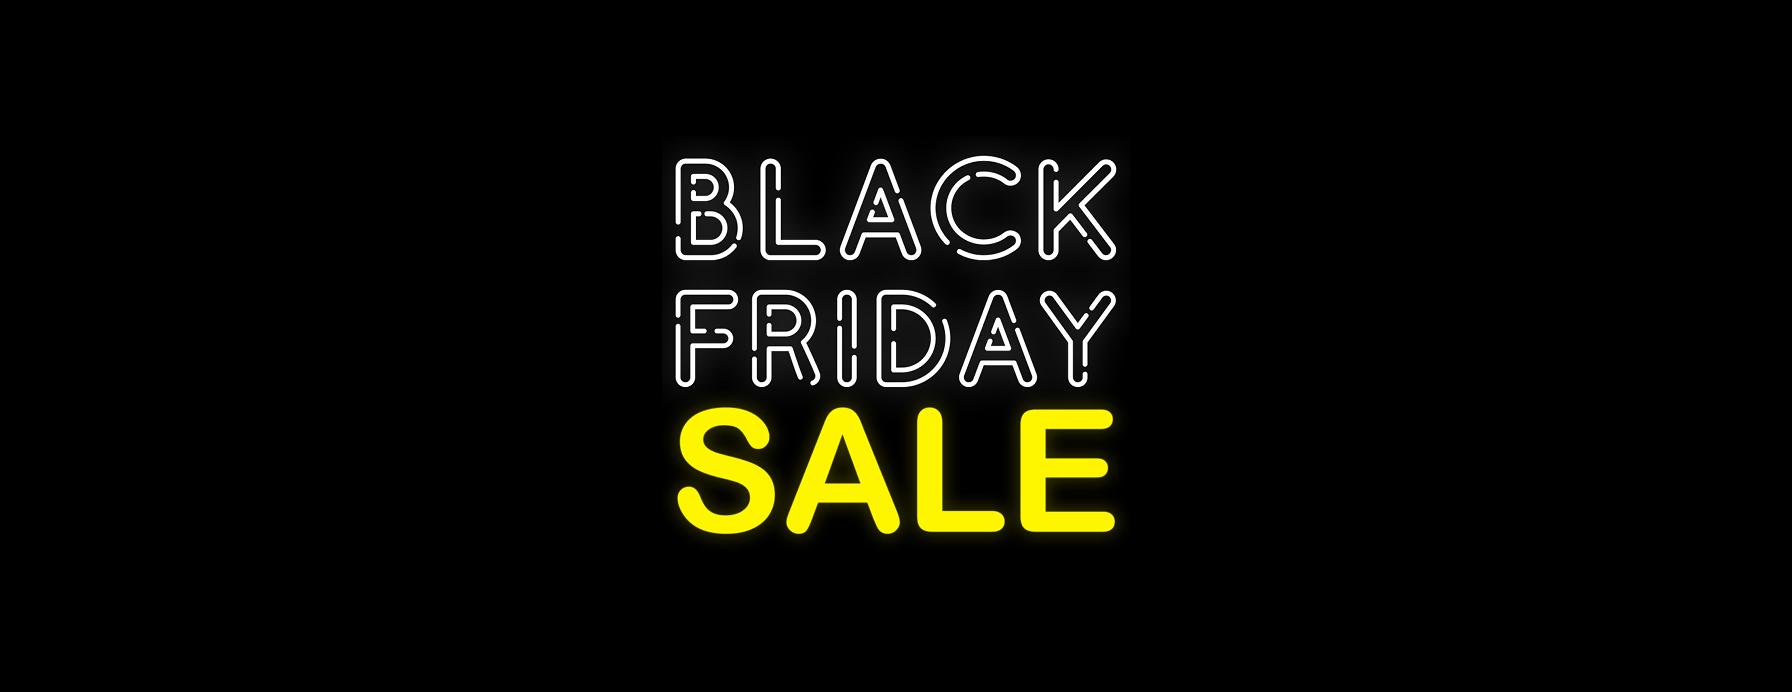 Shop the Black Friday Sale Now!